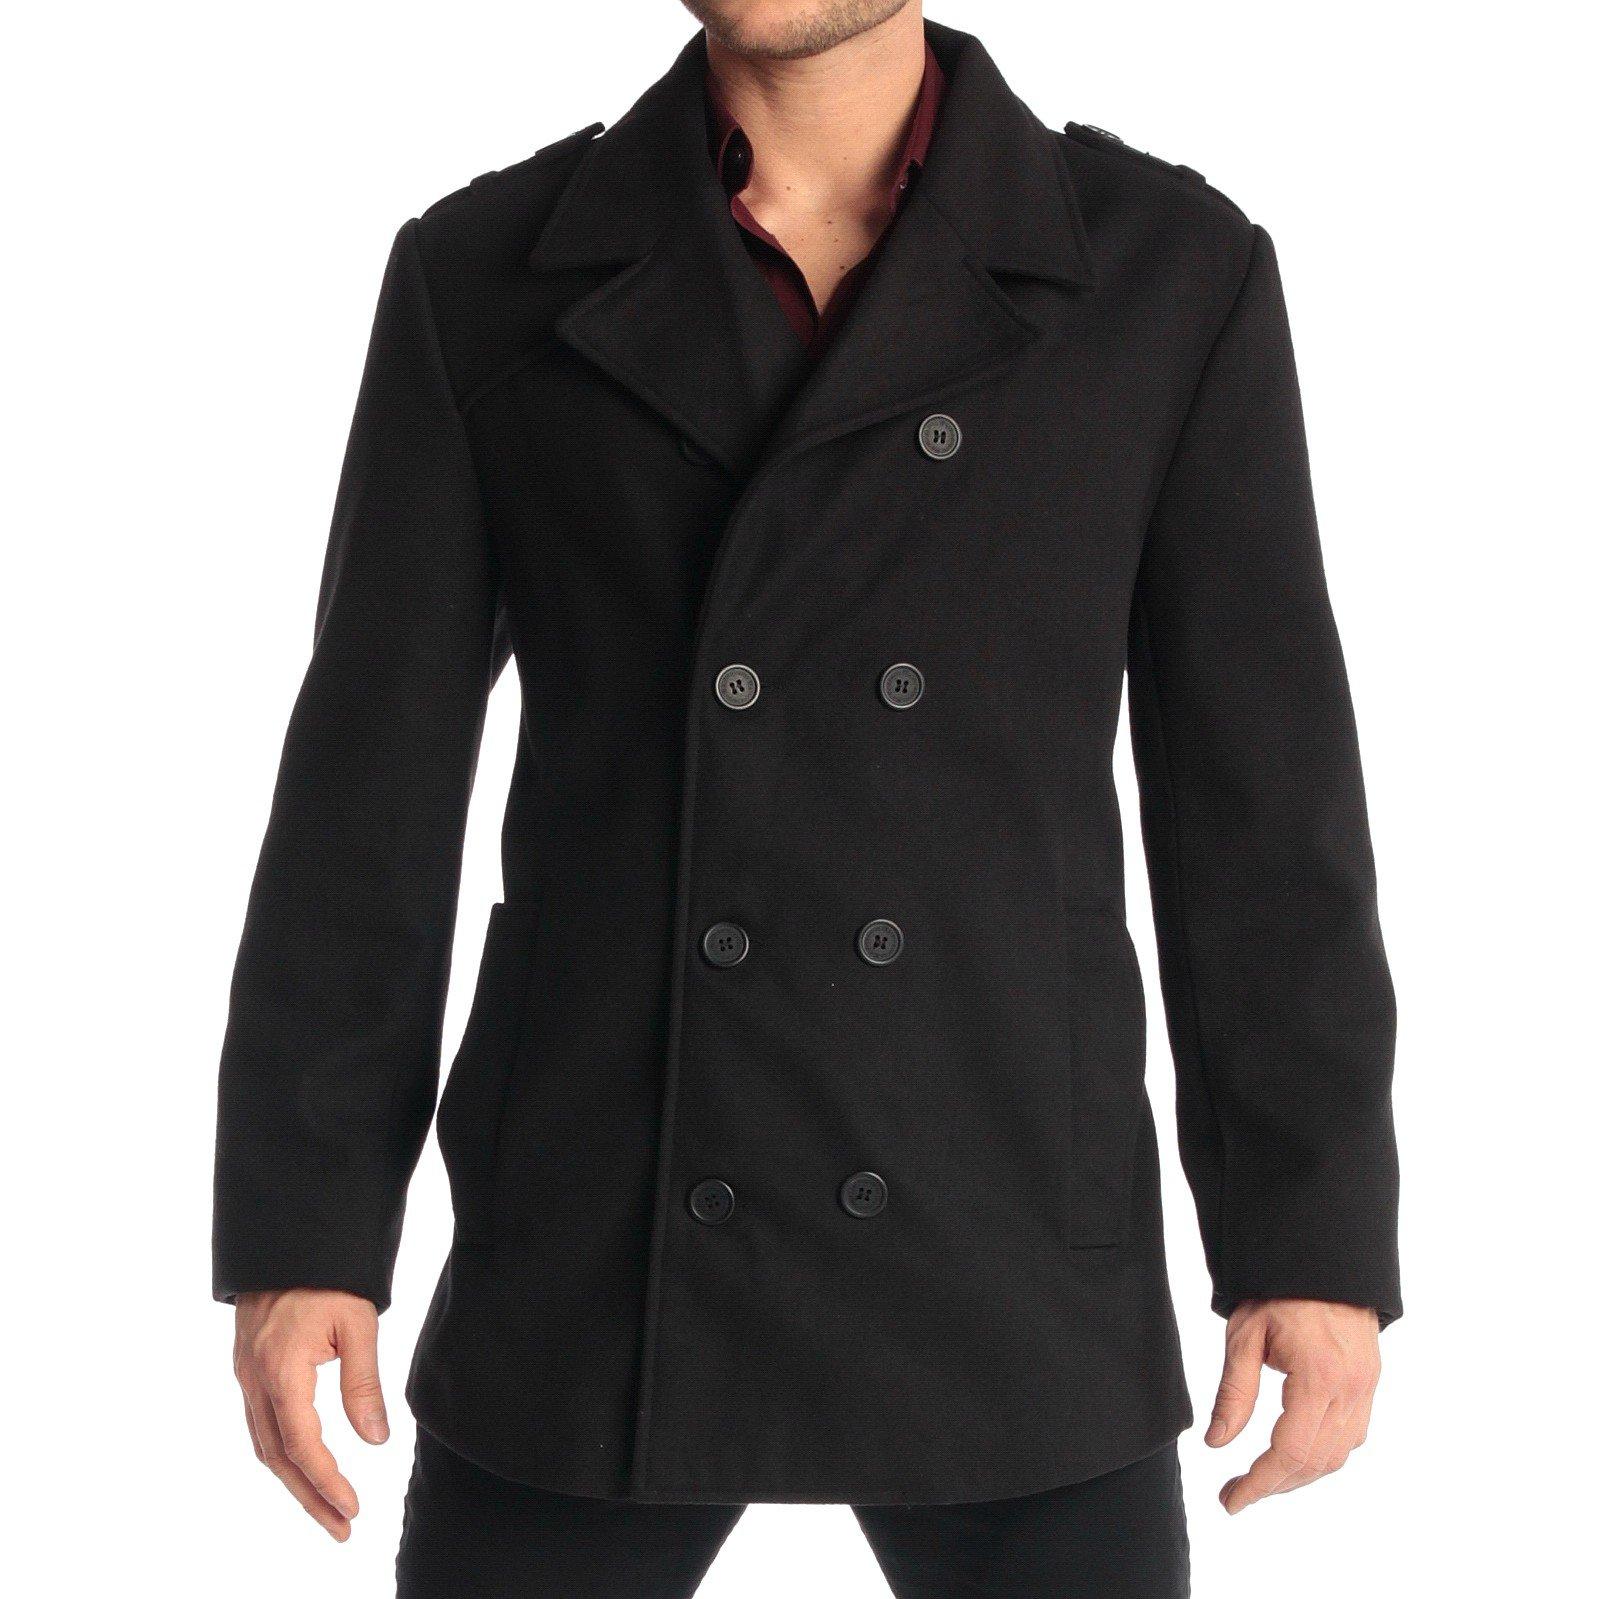 alpine swiss Jake Mens Wool Pea Coat Double Breasted Jacket Black SML